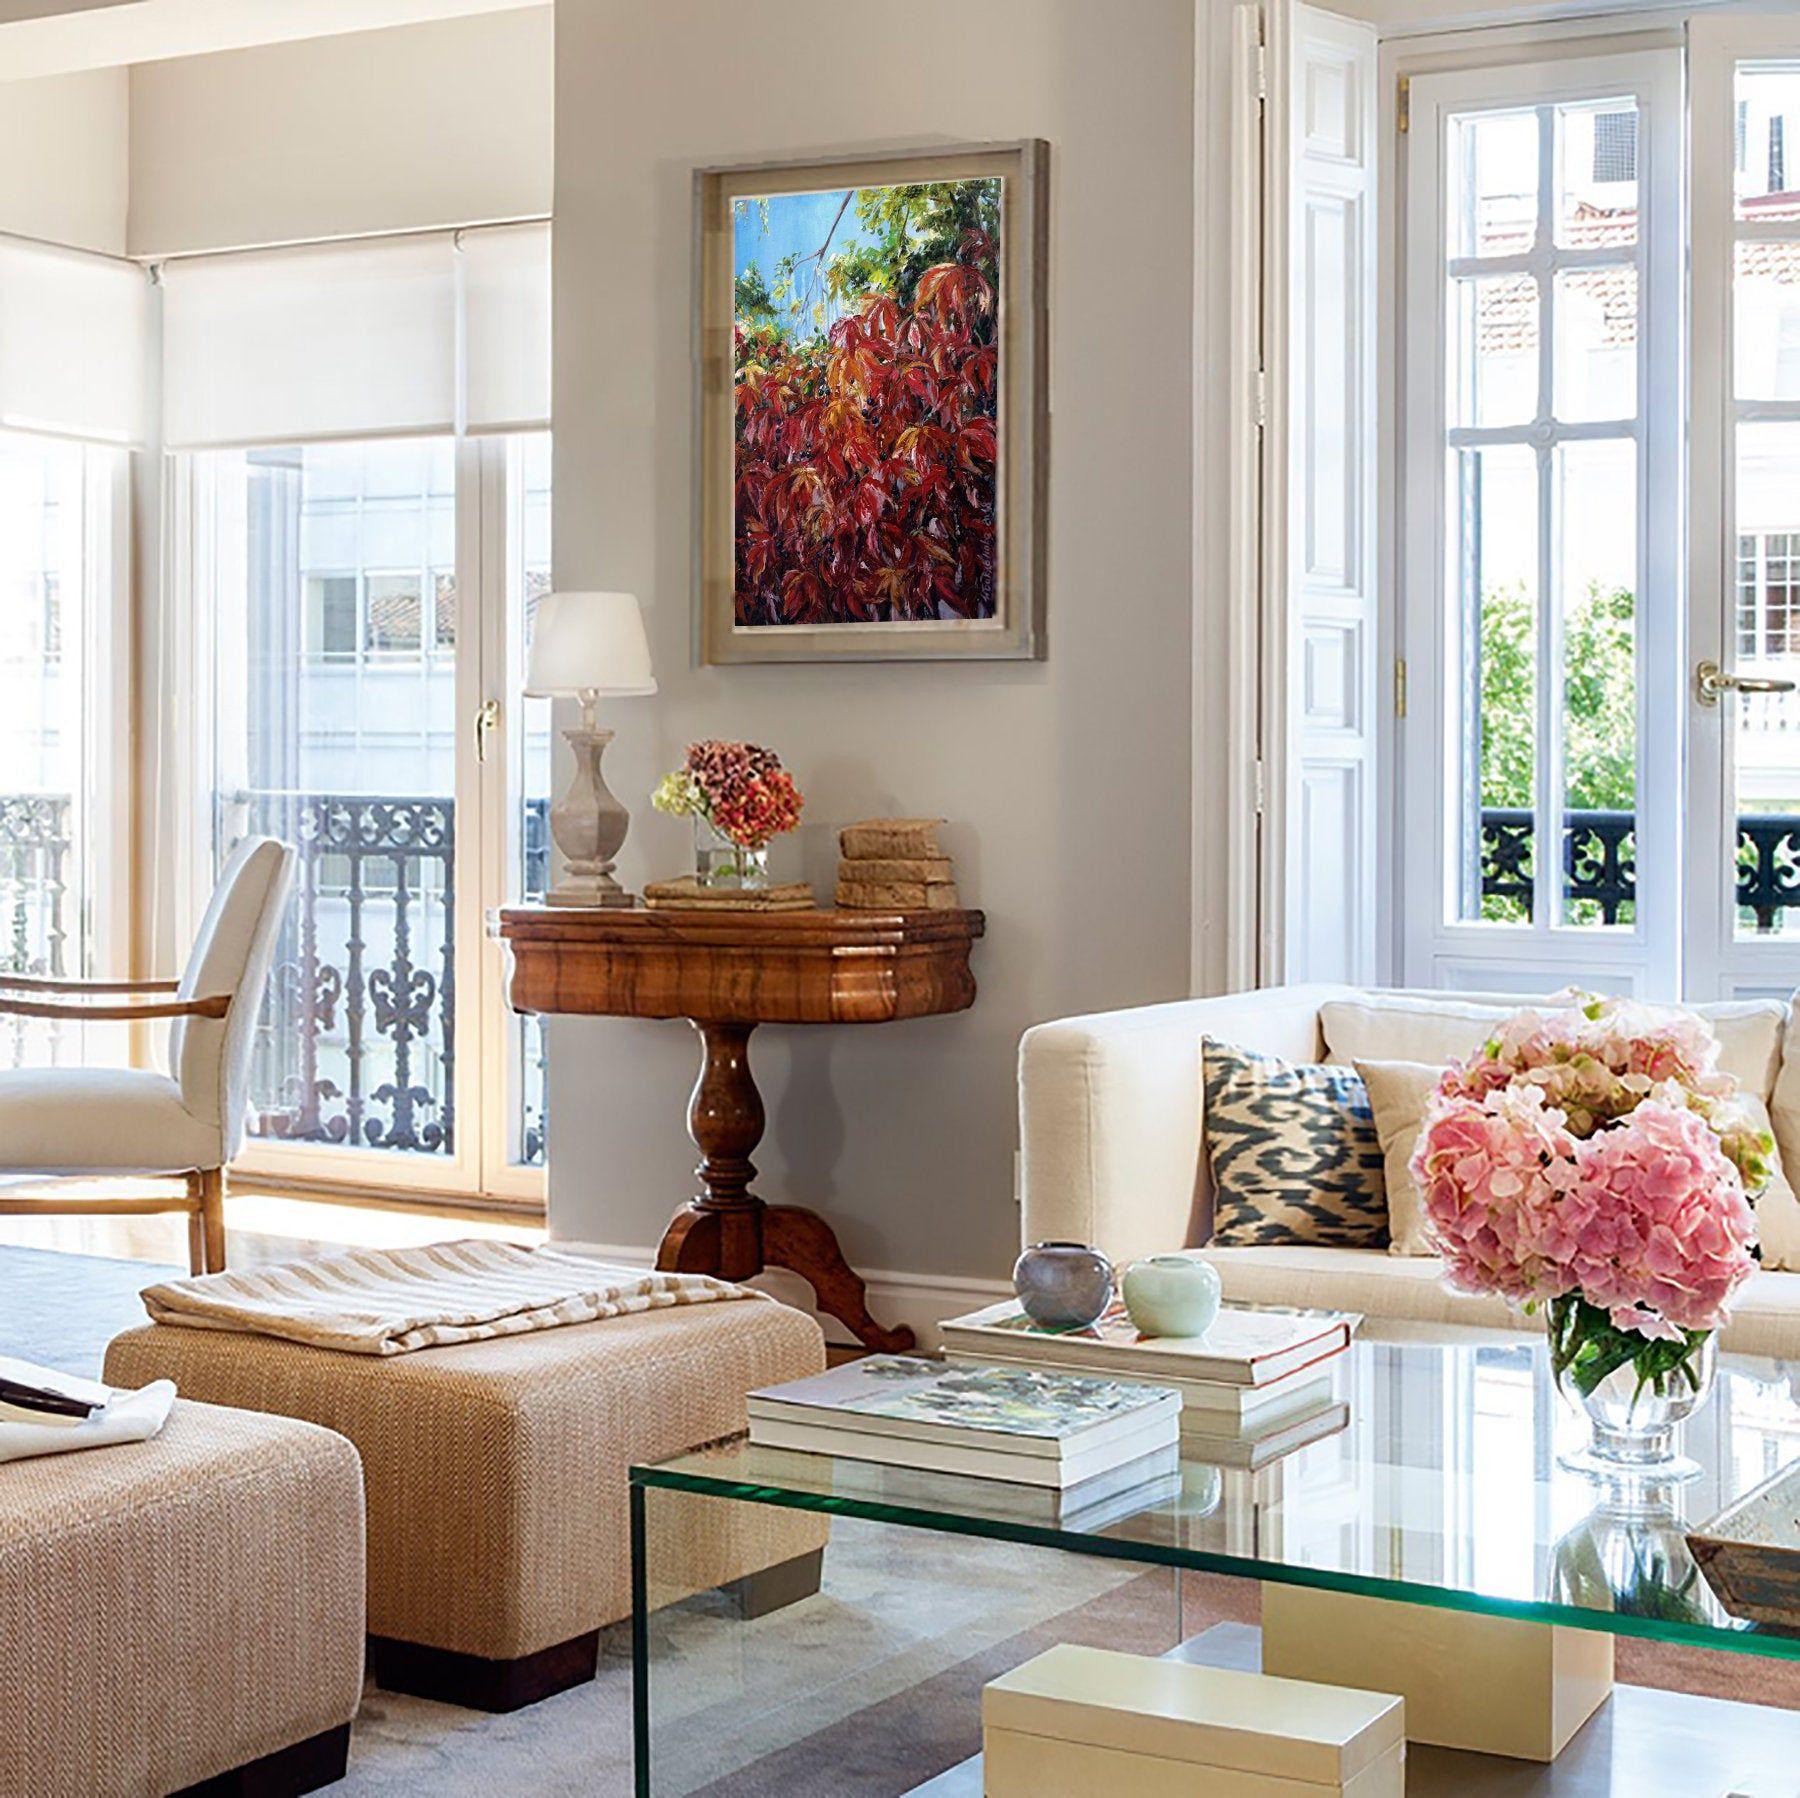 Autumn Colors Modern Original Acrylic Artwork Living Room Etsy In 2020 Perfect Living Room Decor Living Room Decor Home Decor View home living room color ideas